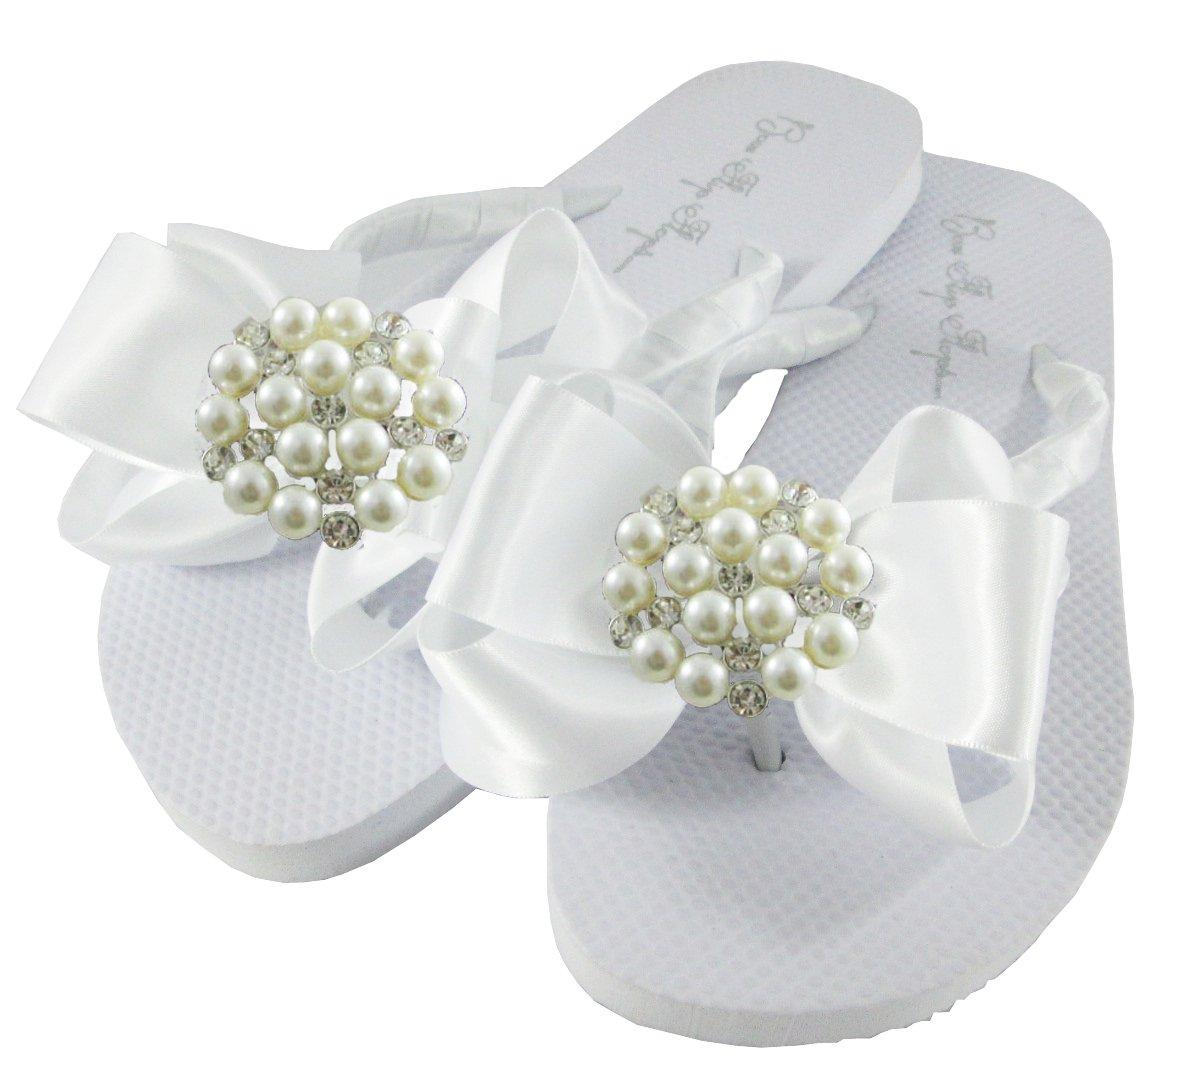 White or Black Ladies /& Girls Pearl Satin Bow Flat Flip Flops